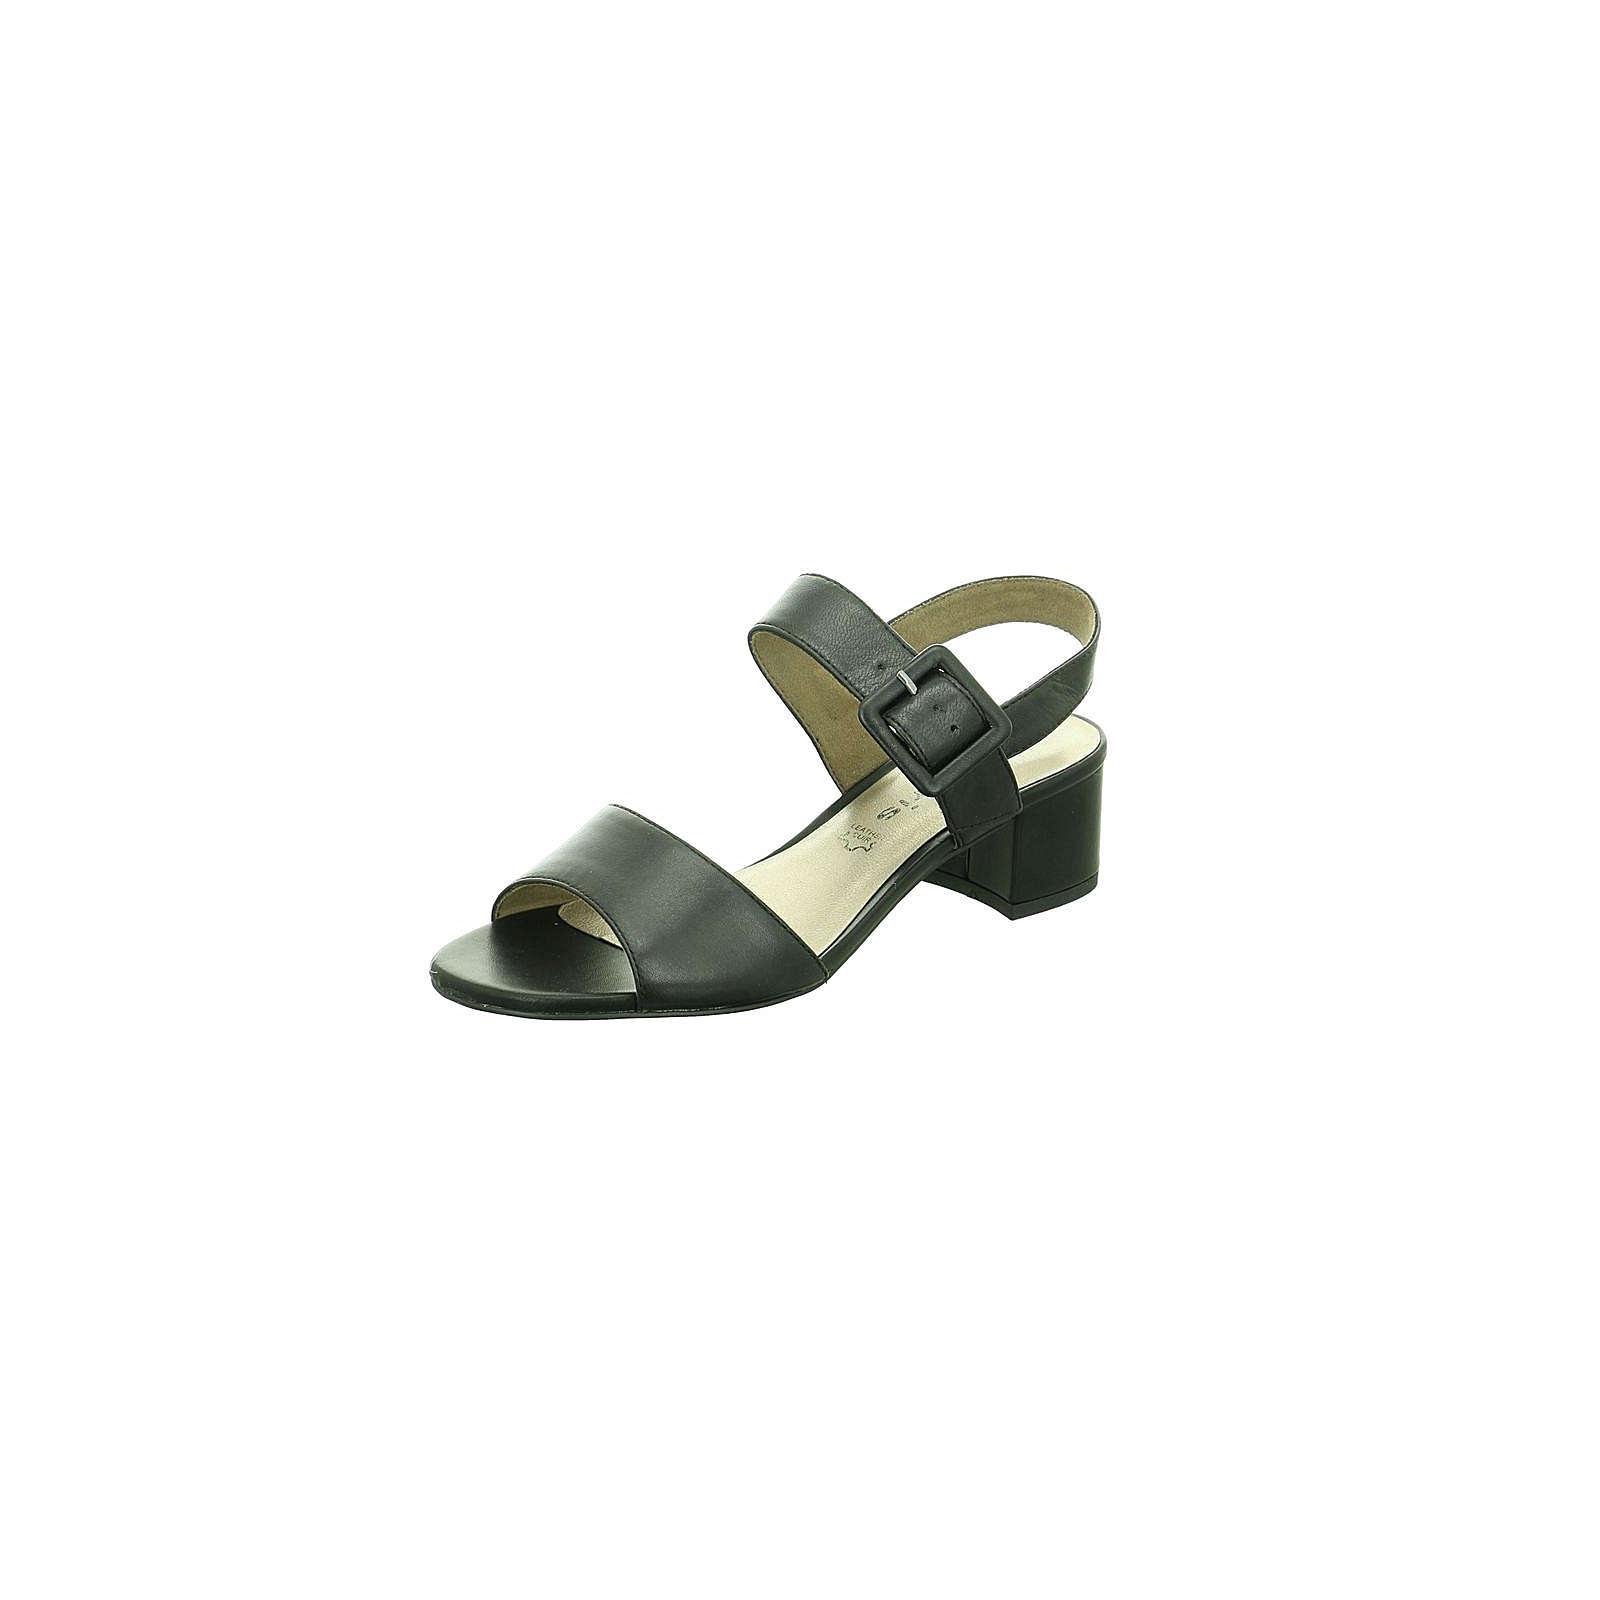 Tamaris Sandalen/Sandaletten schwarz schwarz Damen Gr. 40